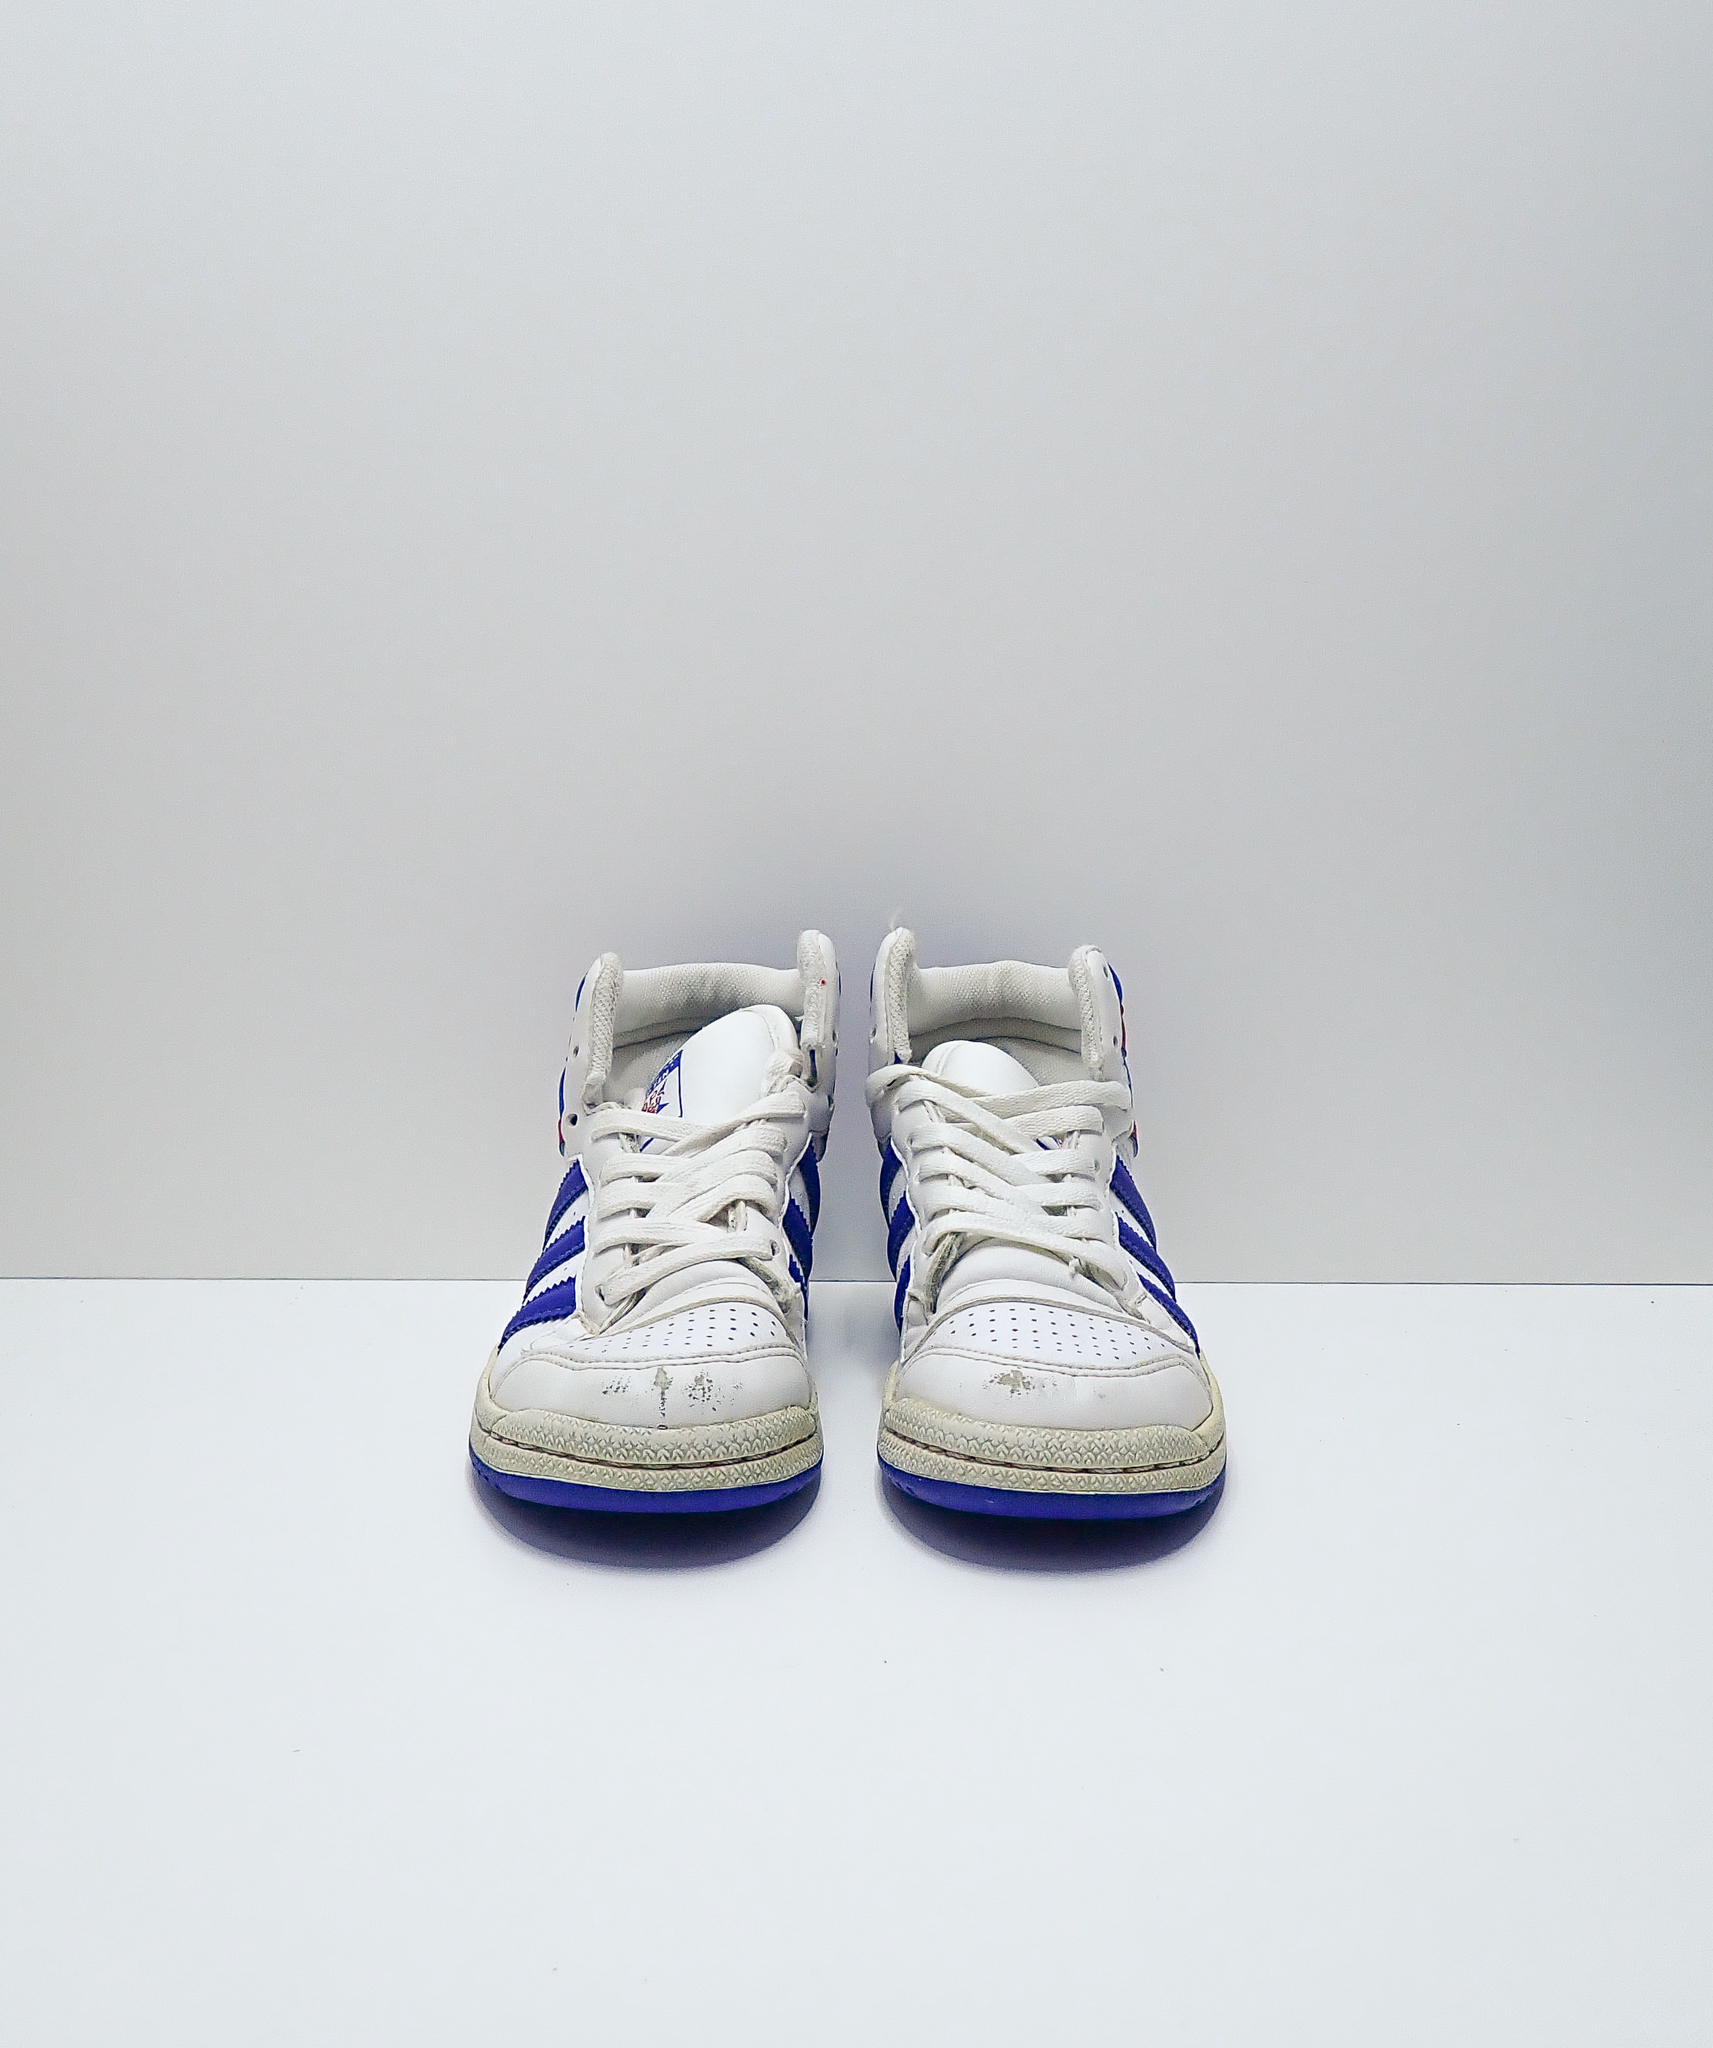 Adidas Top Ten Toddler